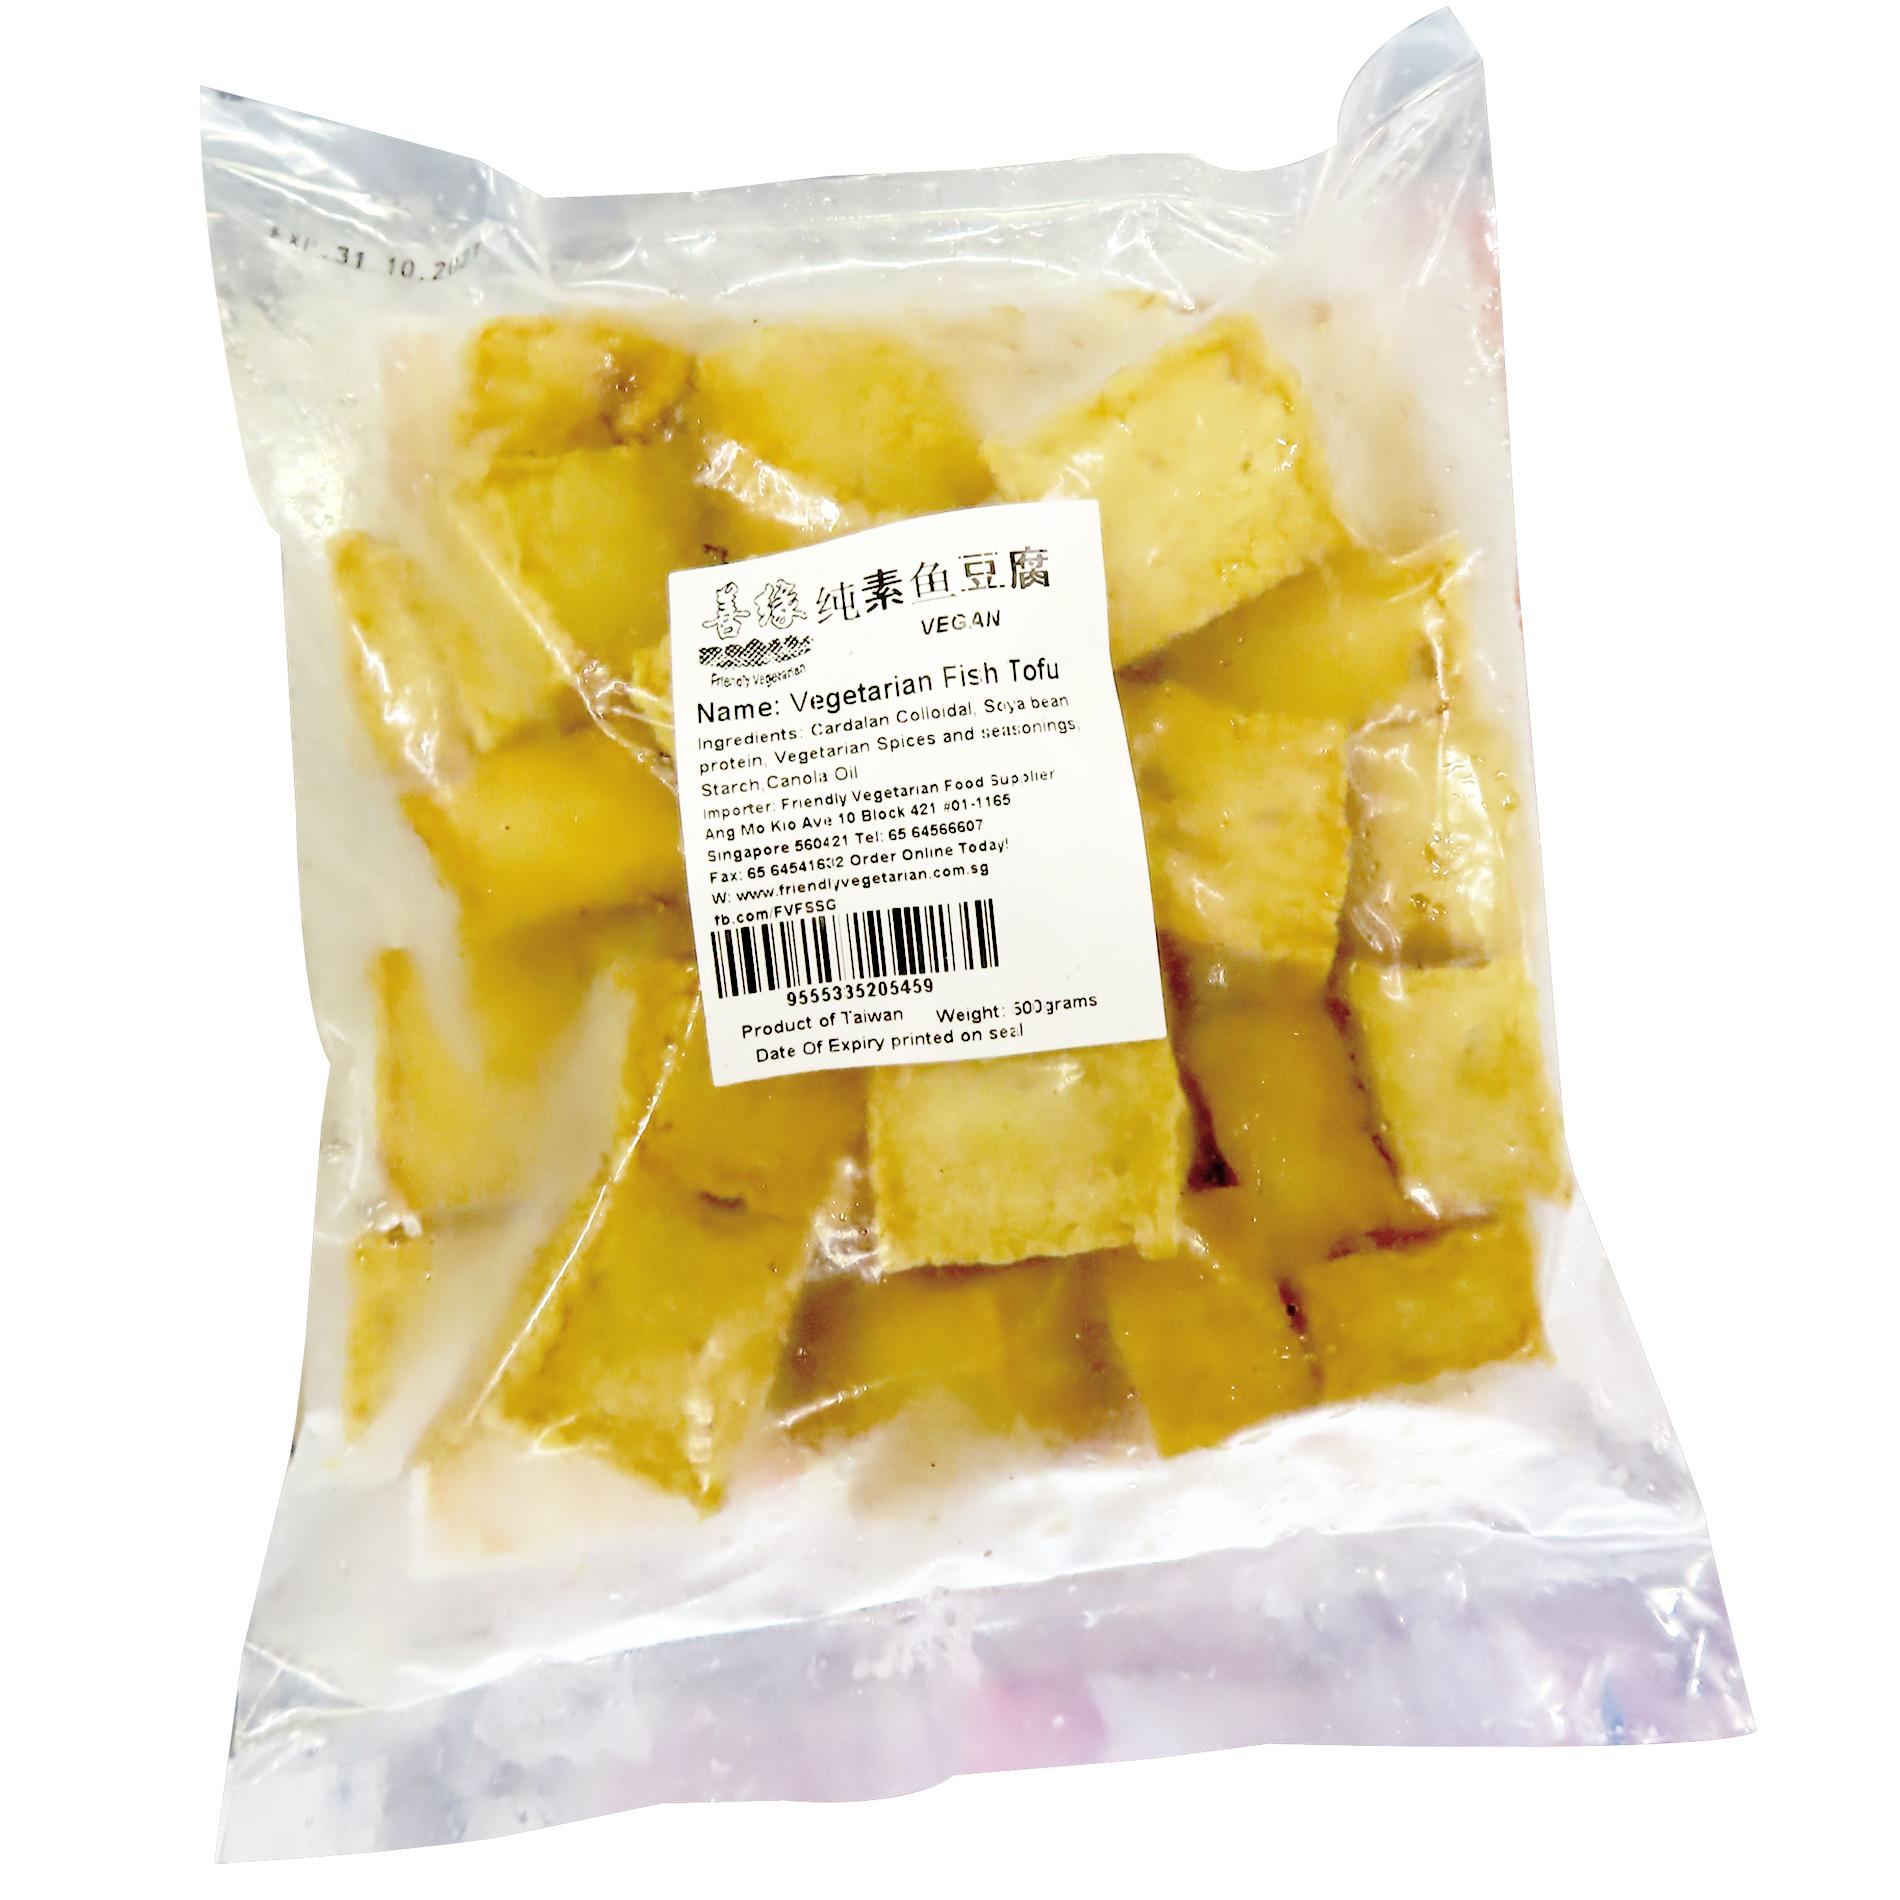 Image Friendly Veggie Fish Tofu 善缘 - 素鱼豆腐 500grams